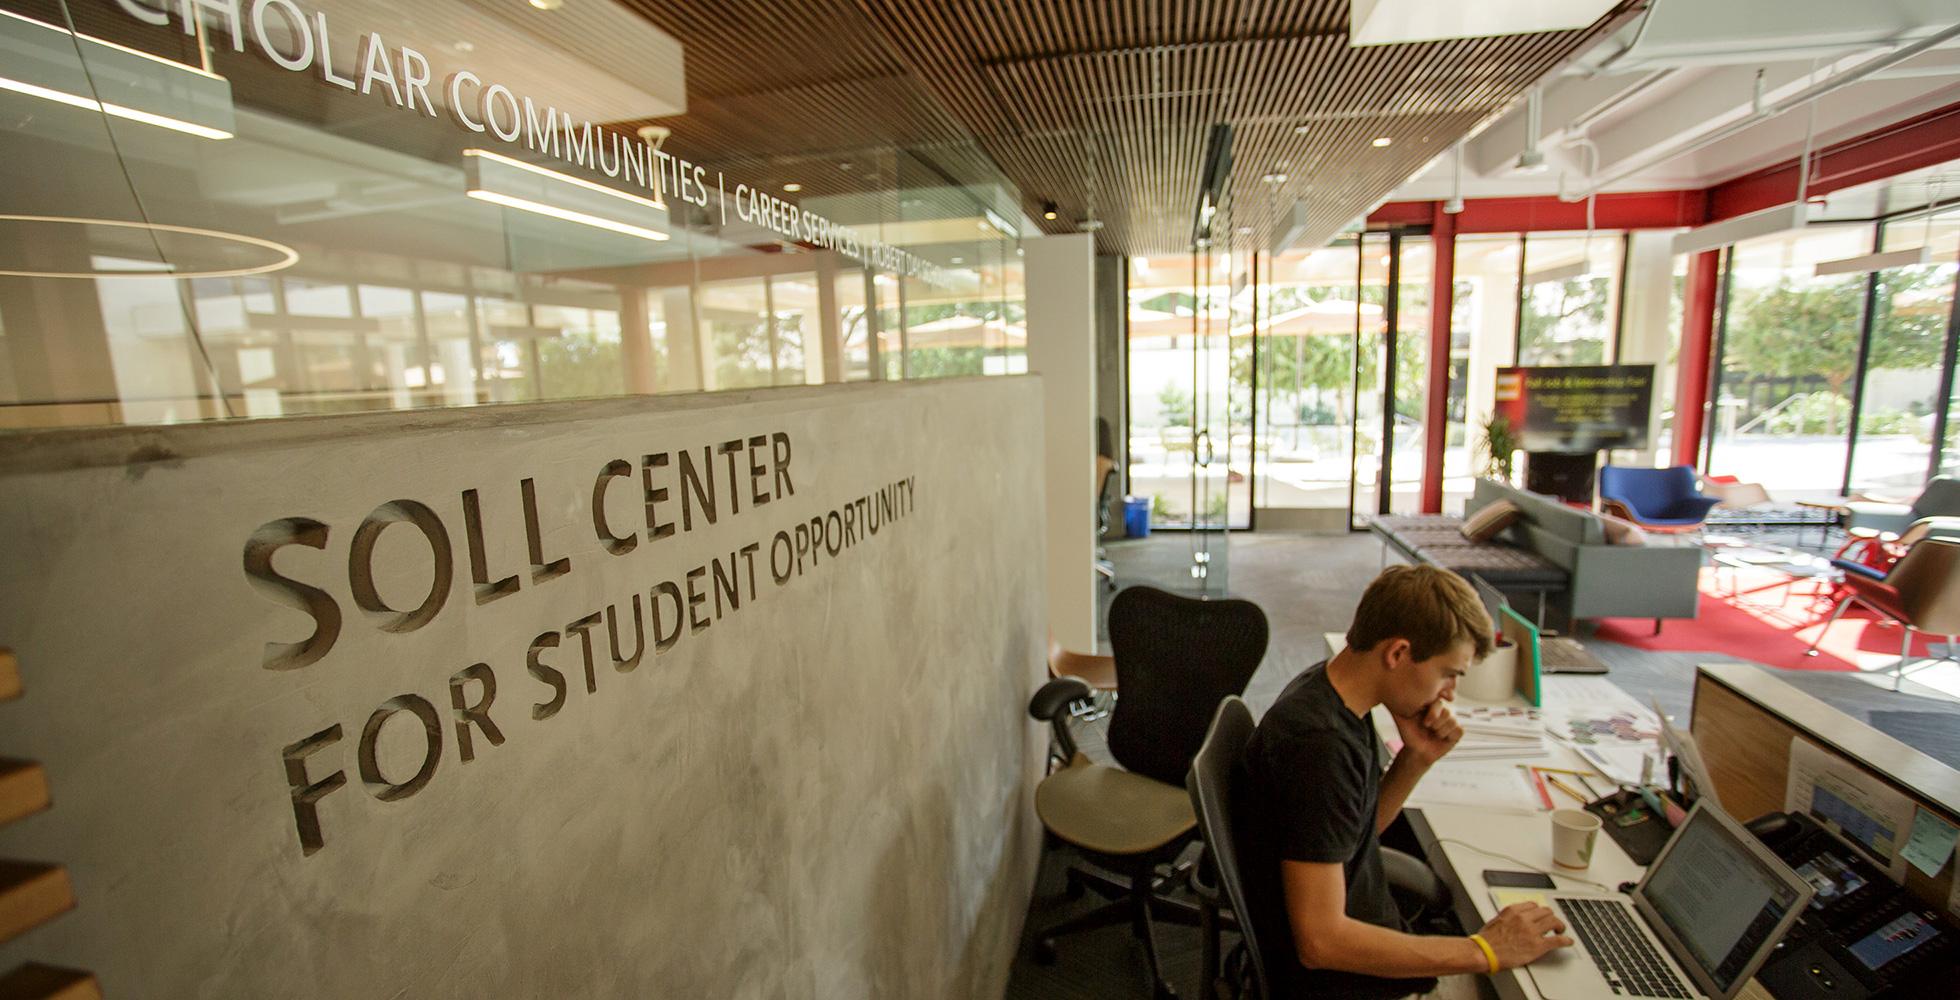 Student Opportunity Center lobby